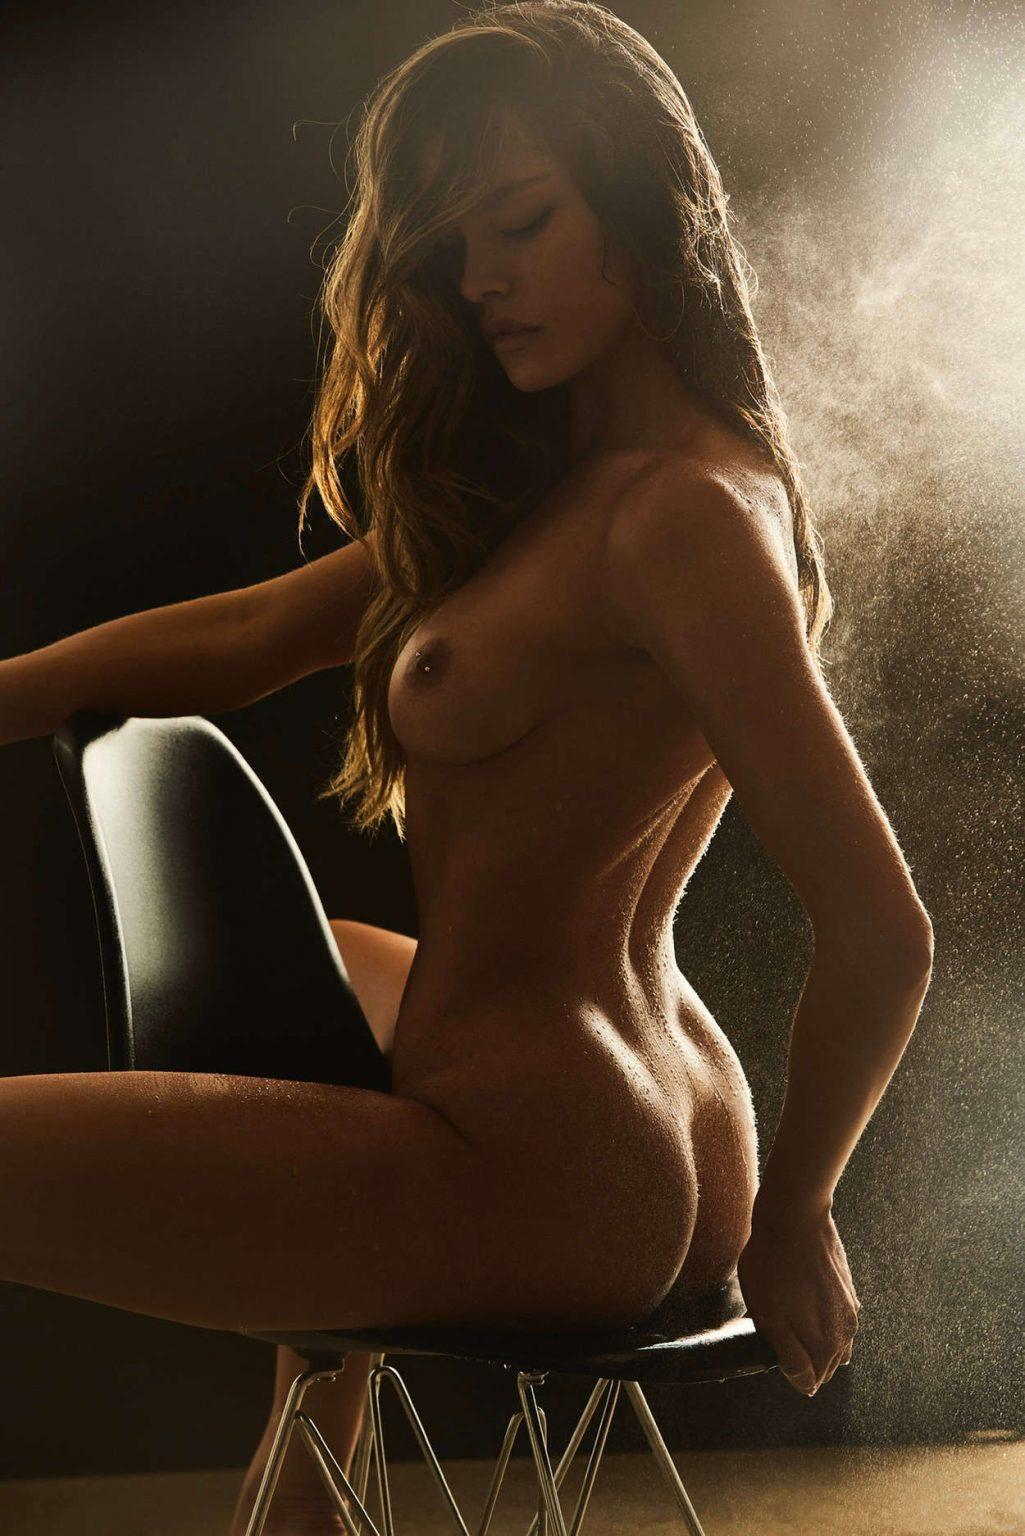 Fit-Naked-Girls-com-Cherokee-Luker-nude-fit-9-1025x1536